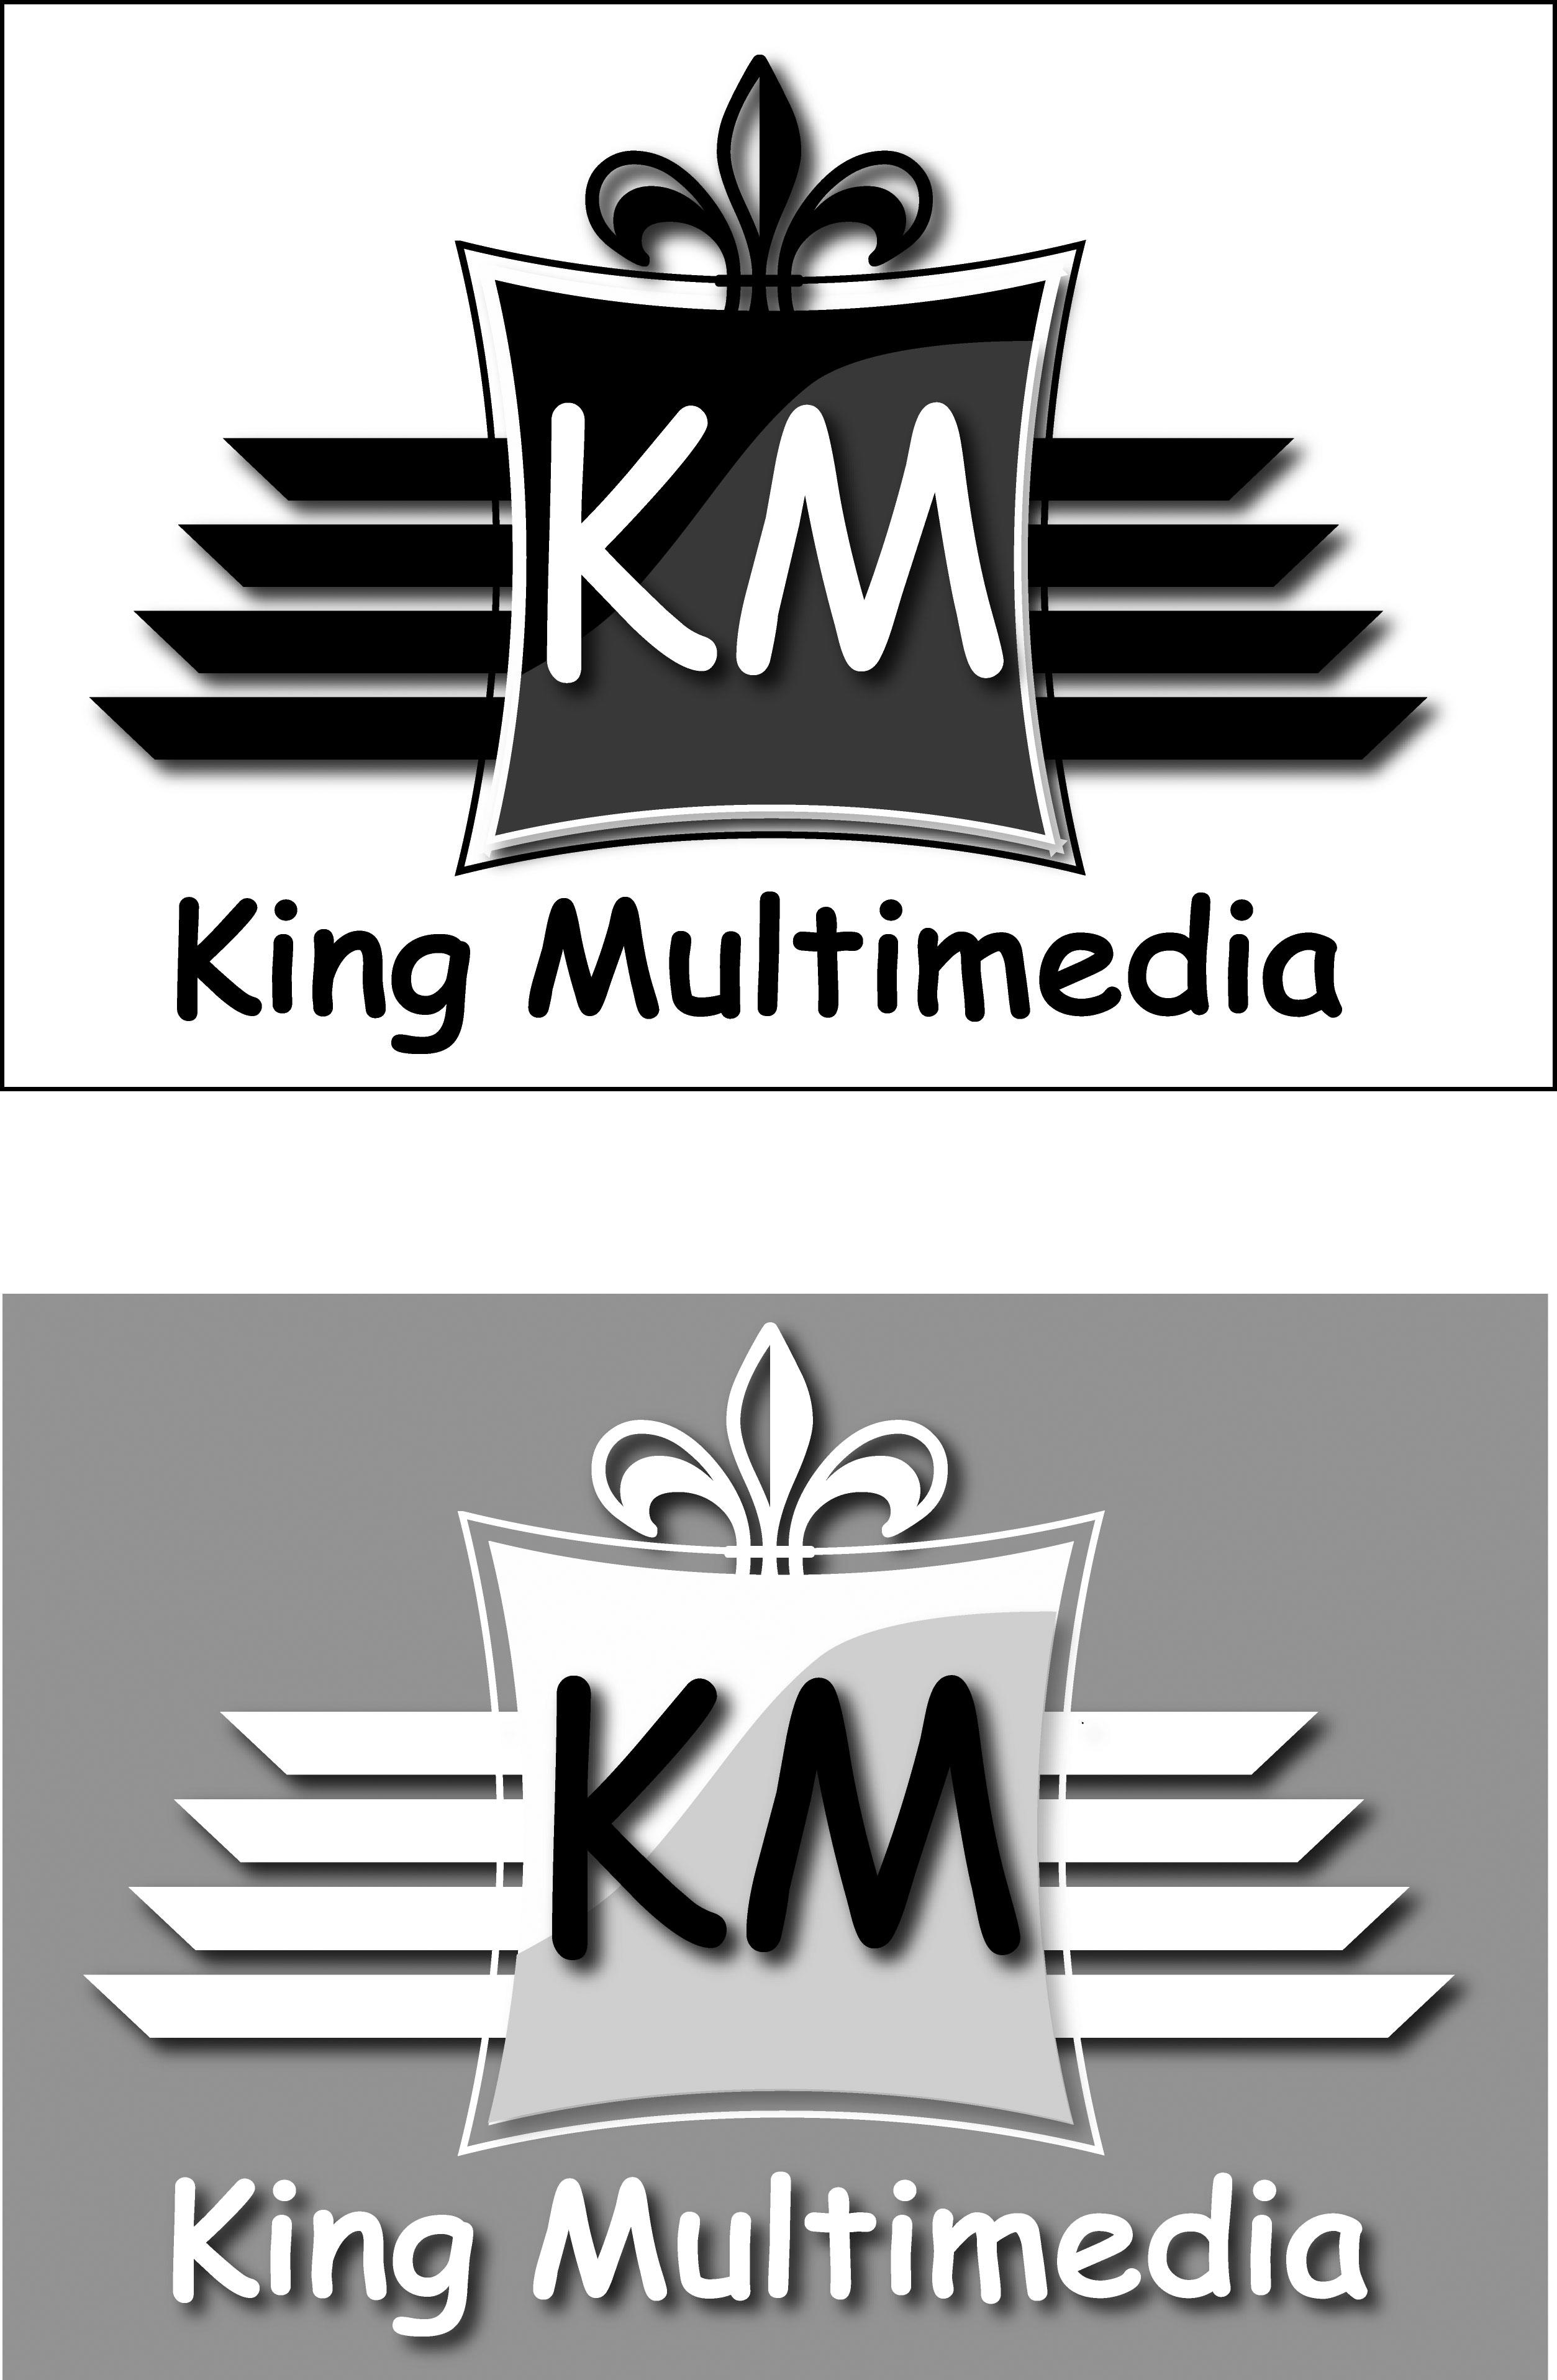 King Multimedia